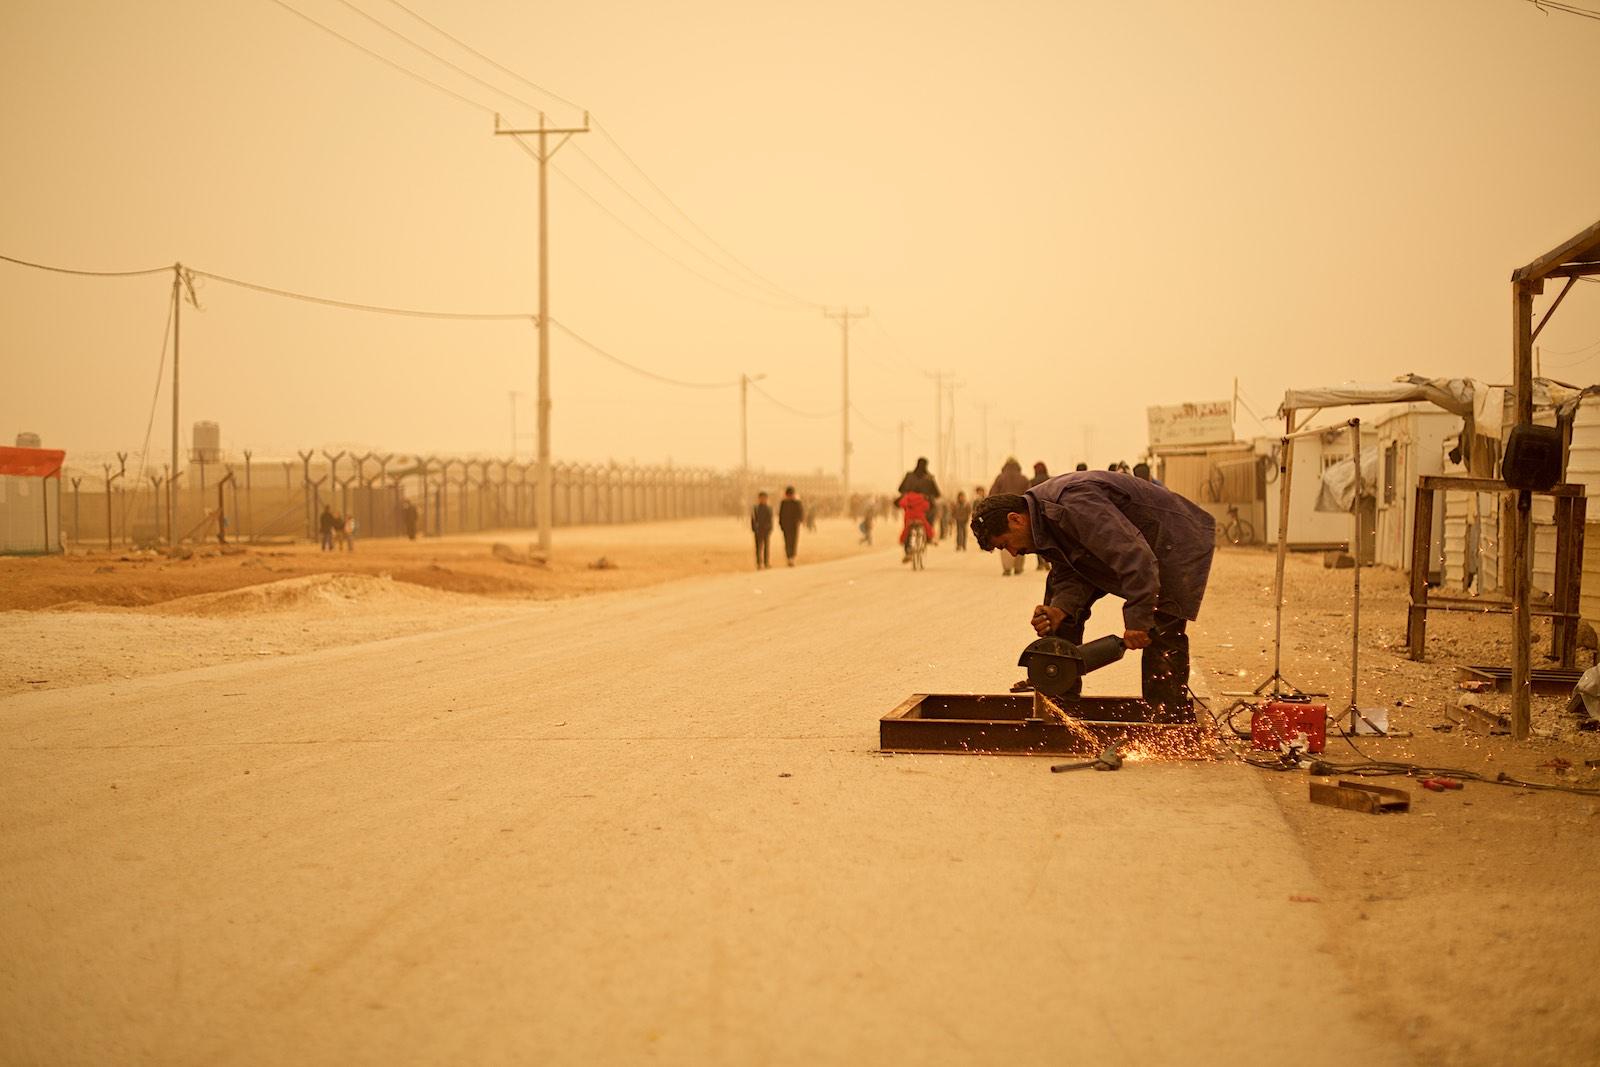 denis-bosnic-zaatari-jordan-refugee-camp-31.jpg